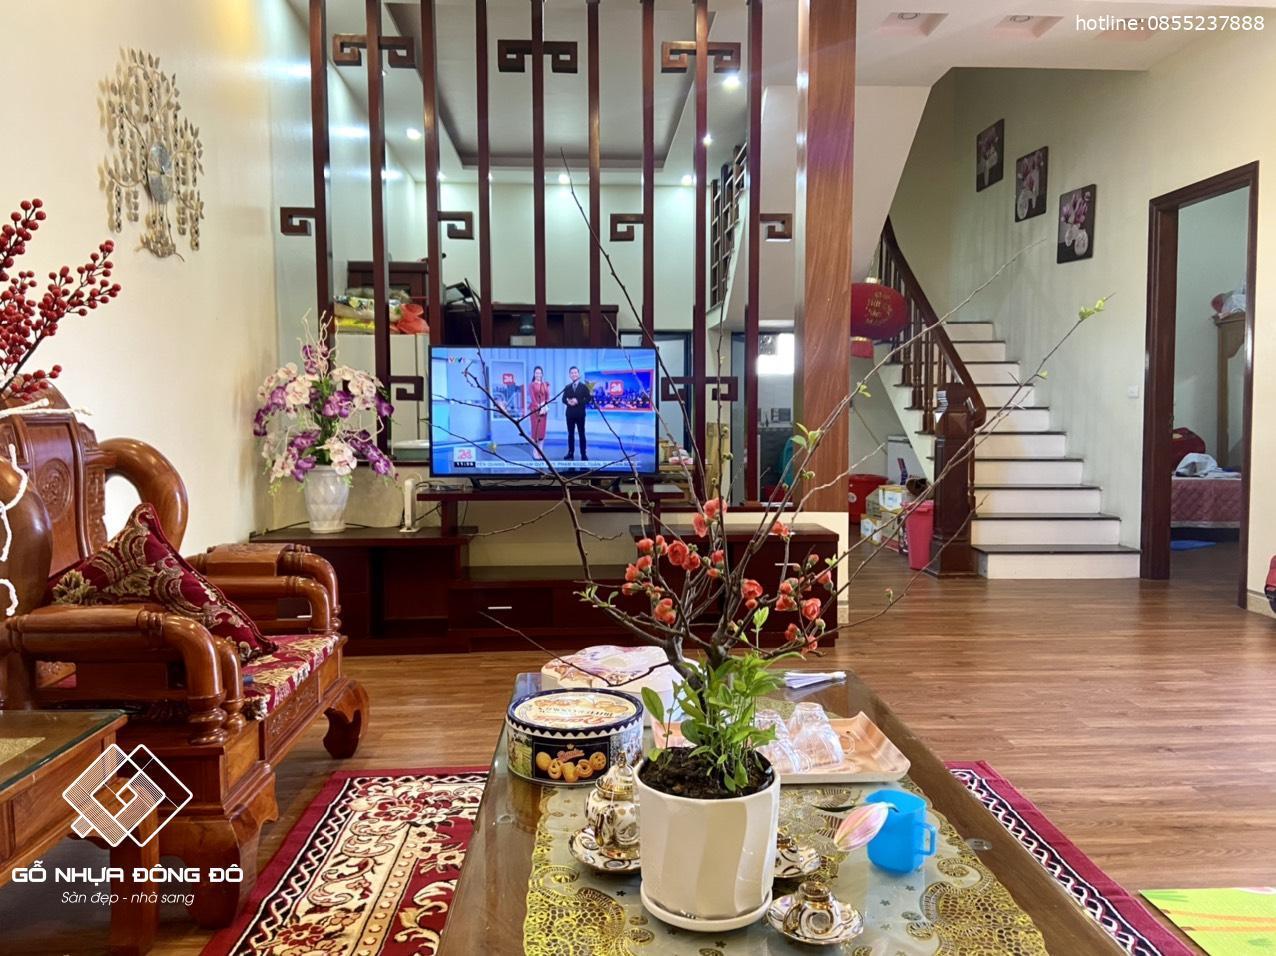 Vach Ngan Phong Khach Thanh Lam Hop Phong Khach Dep 18